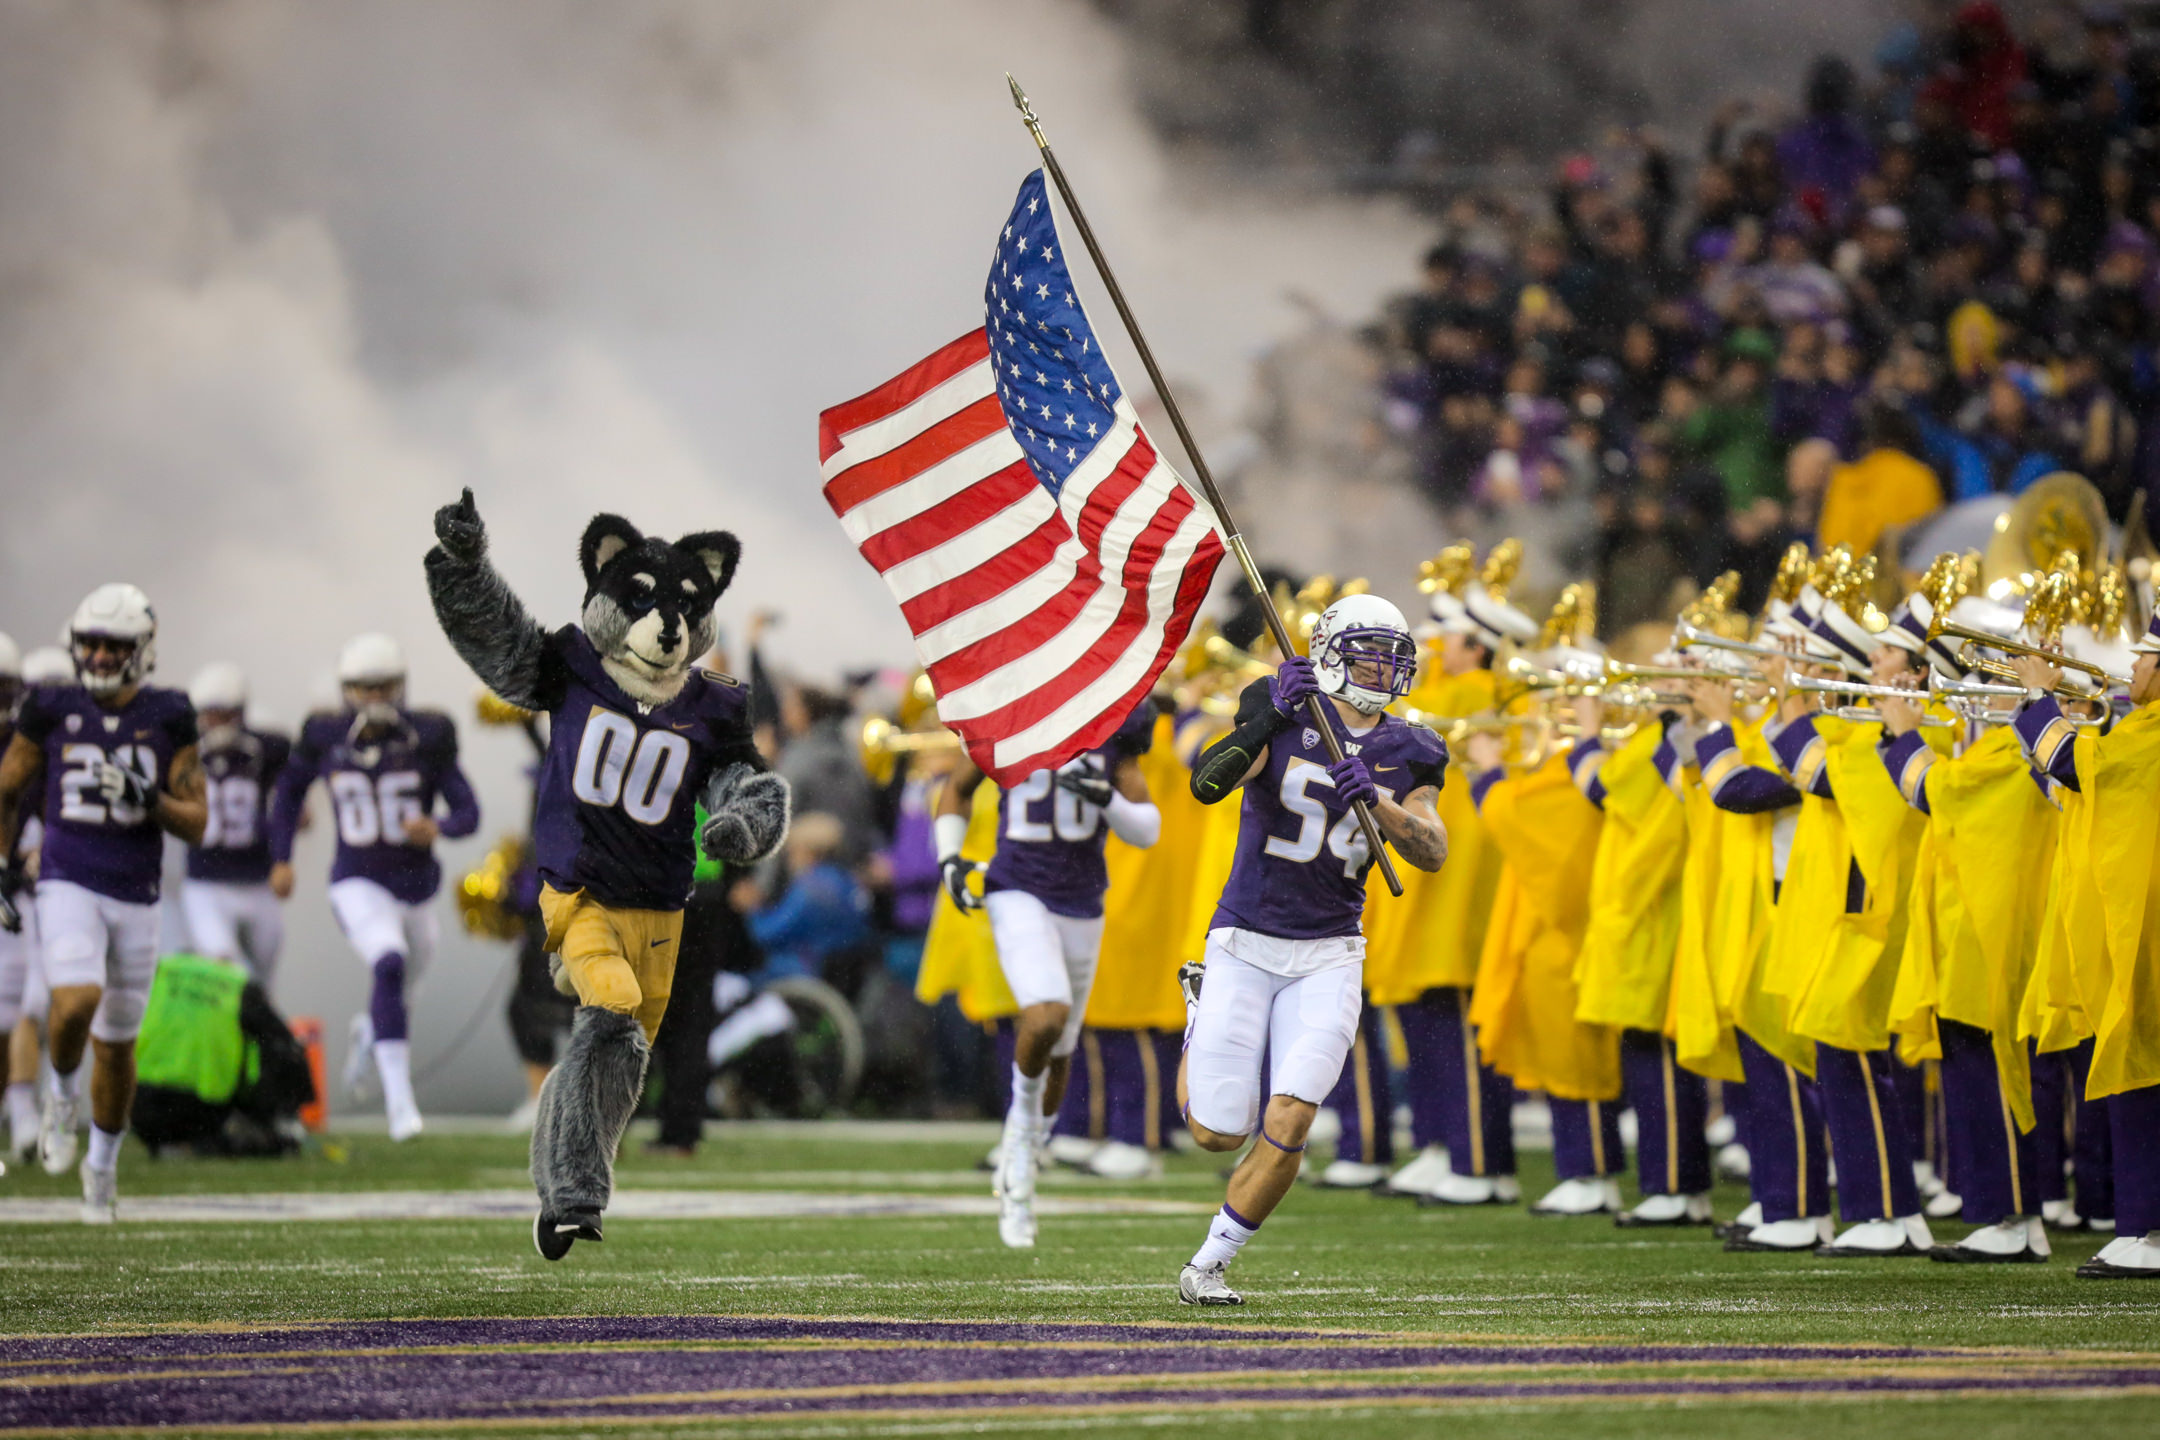 University of Washington Huskies Football Linebacker Matt Preston Hoists the American United States of America Flag on Run out Pregame